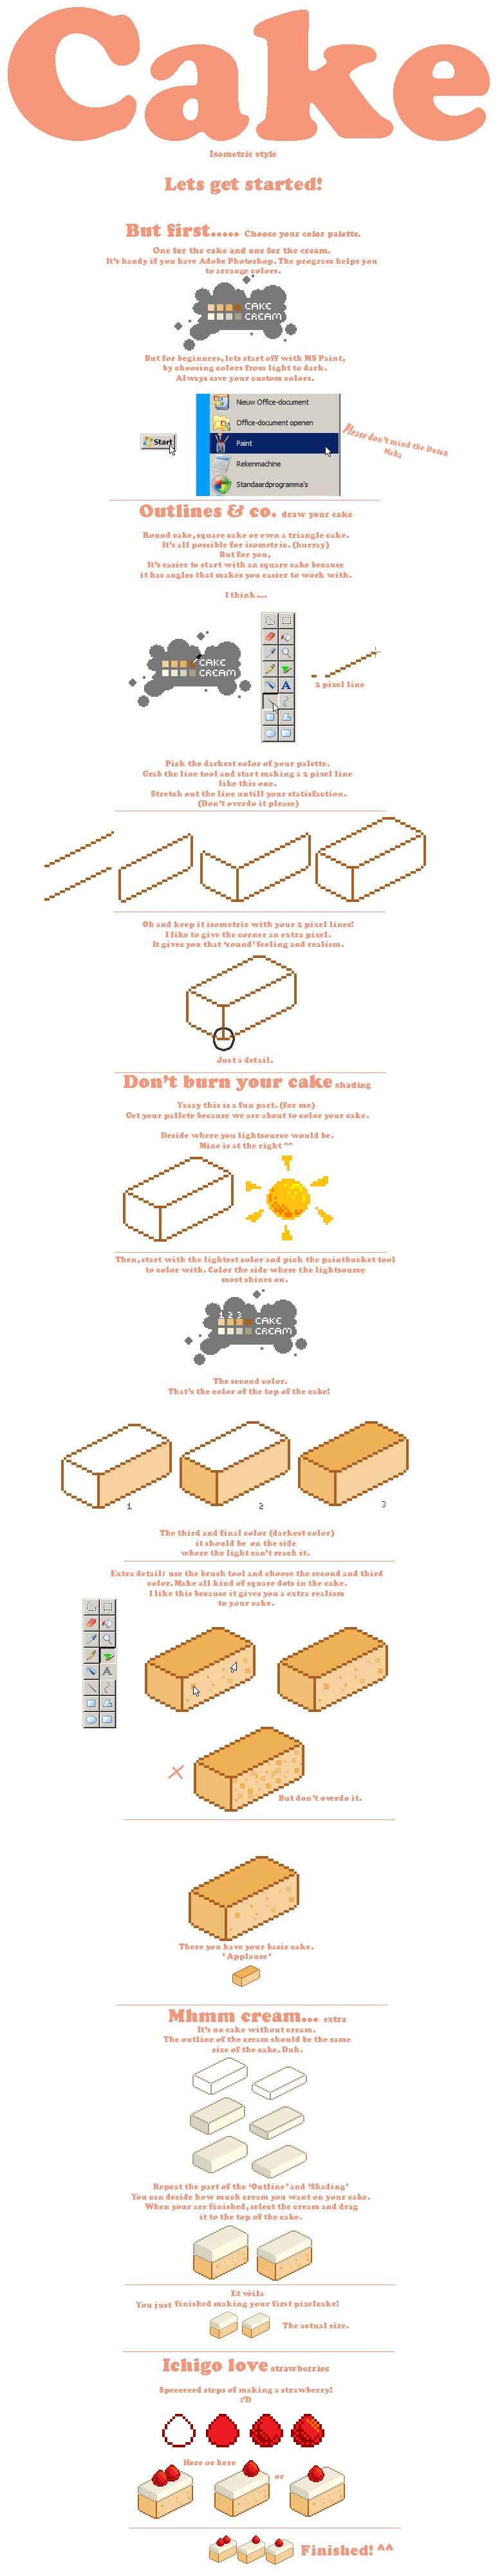 Pixel cake tutorial :'D by Ice-Pandora